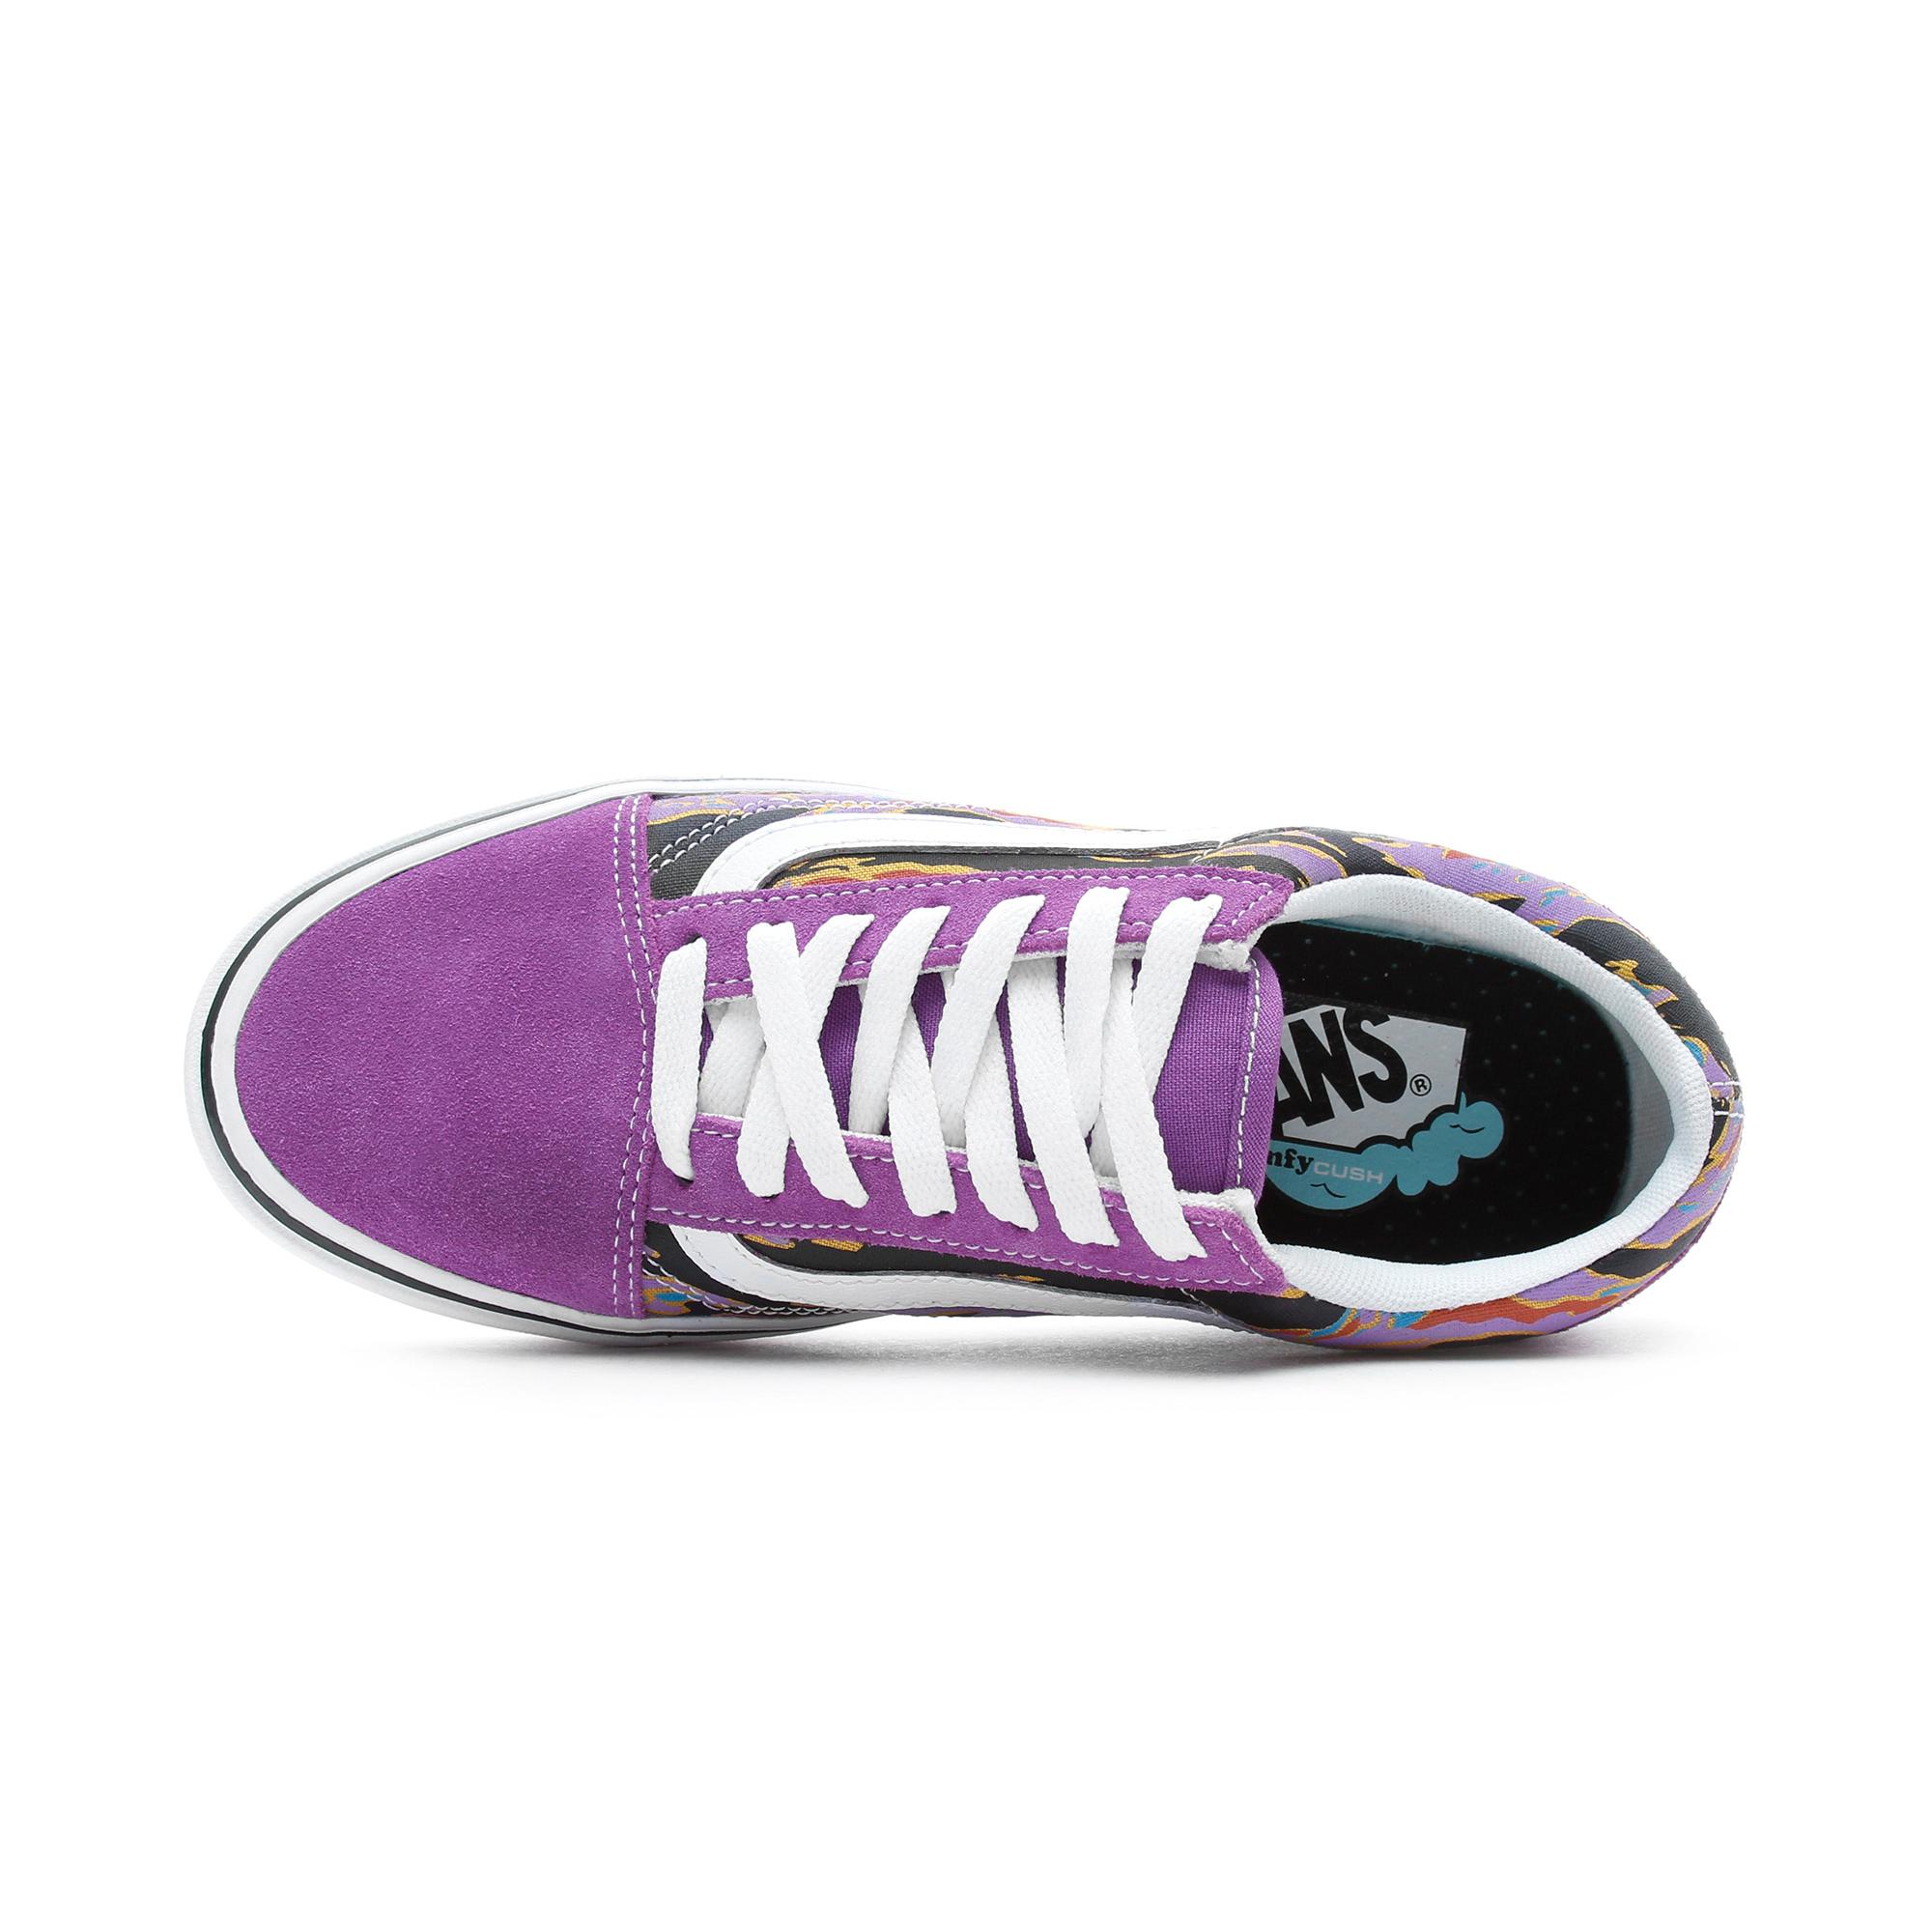 Vans ComfyCush Old Skool Kadın Mor Sneaker